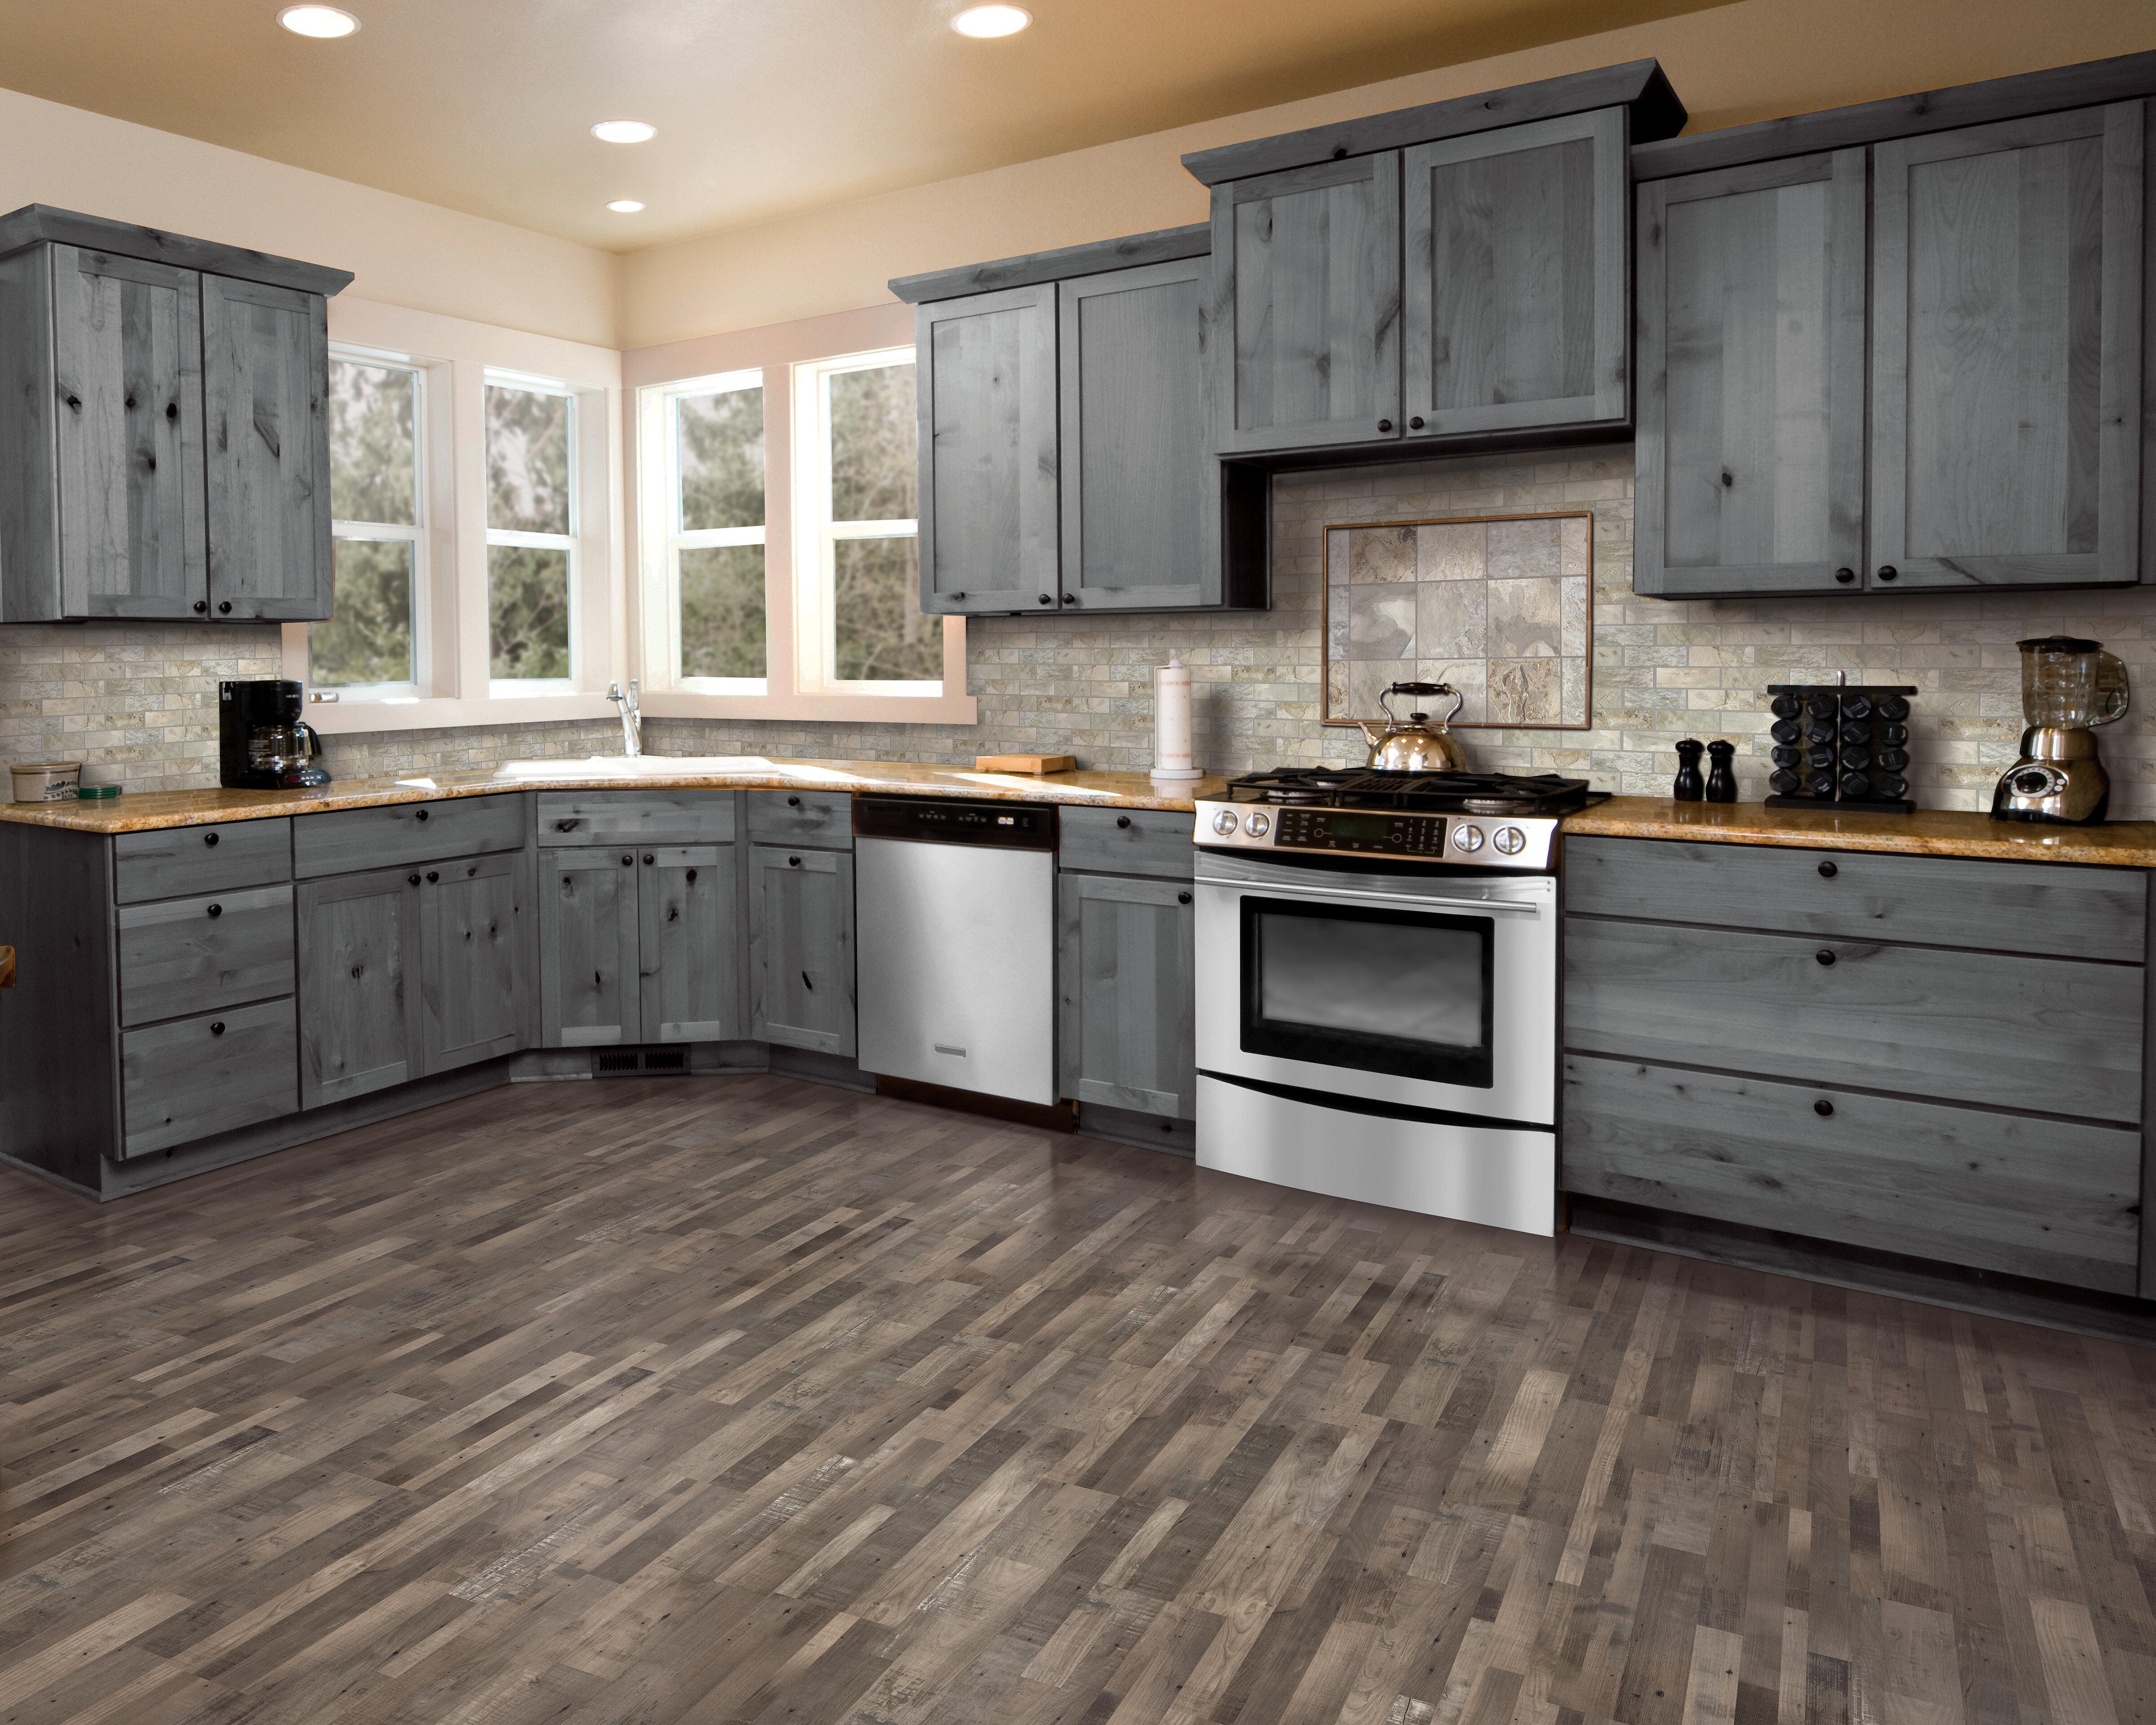 Mohawk 7 5 X 47 25 0 3mm Pine Laminate Flooring In Weathered Gray Wayfair